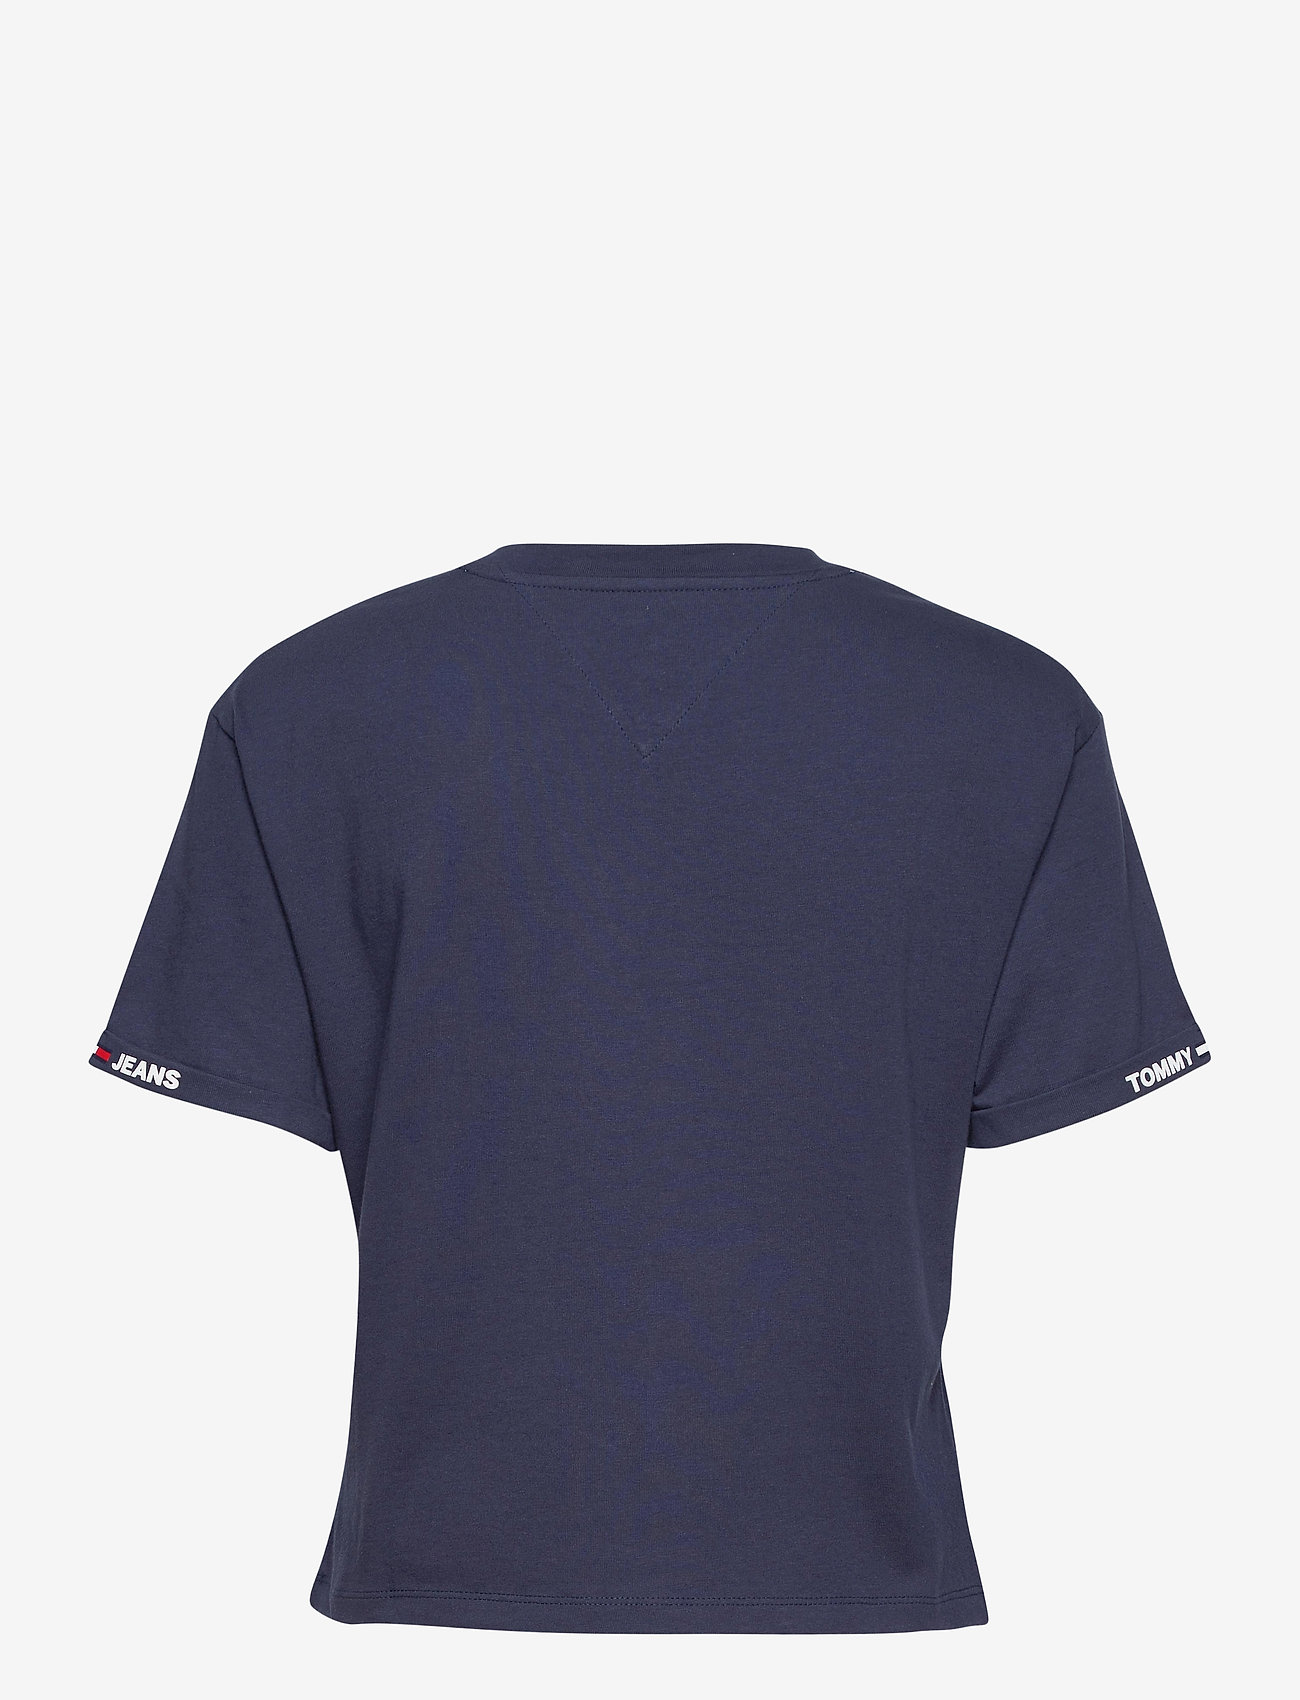 Tommy Jeans - TJW CROP BRANDED TEE - crop tops - twilight navy - 1